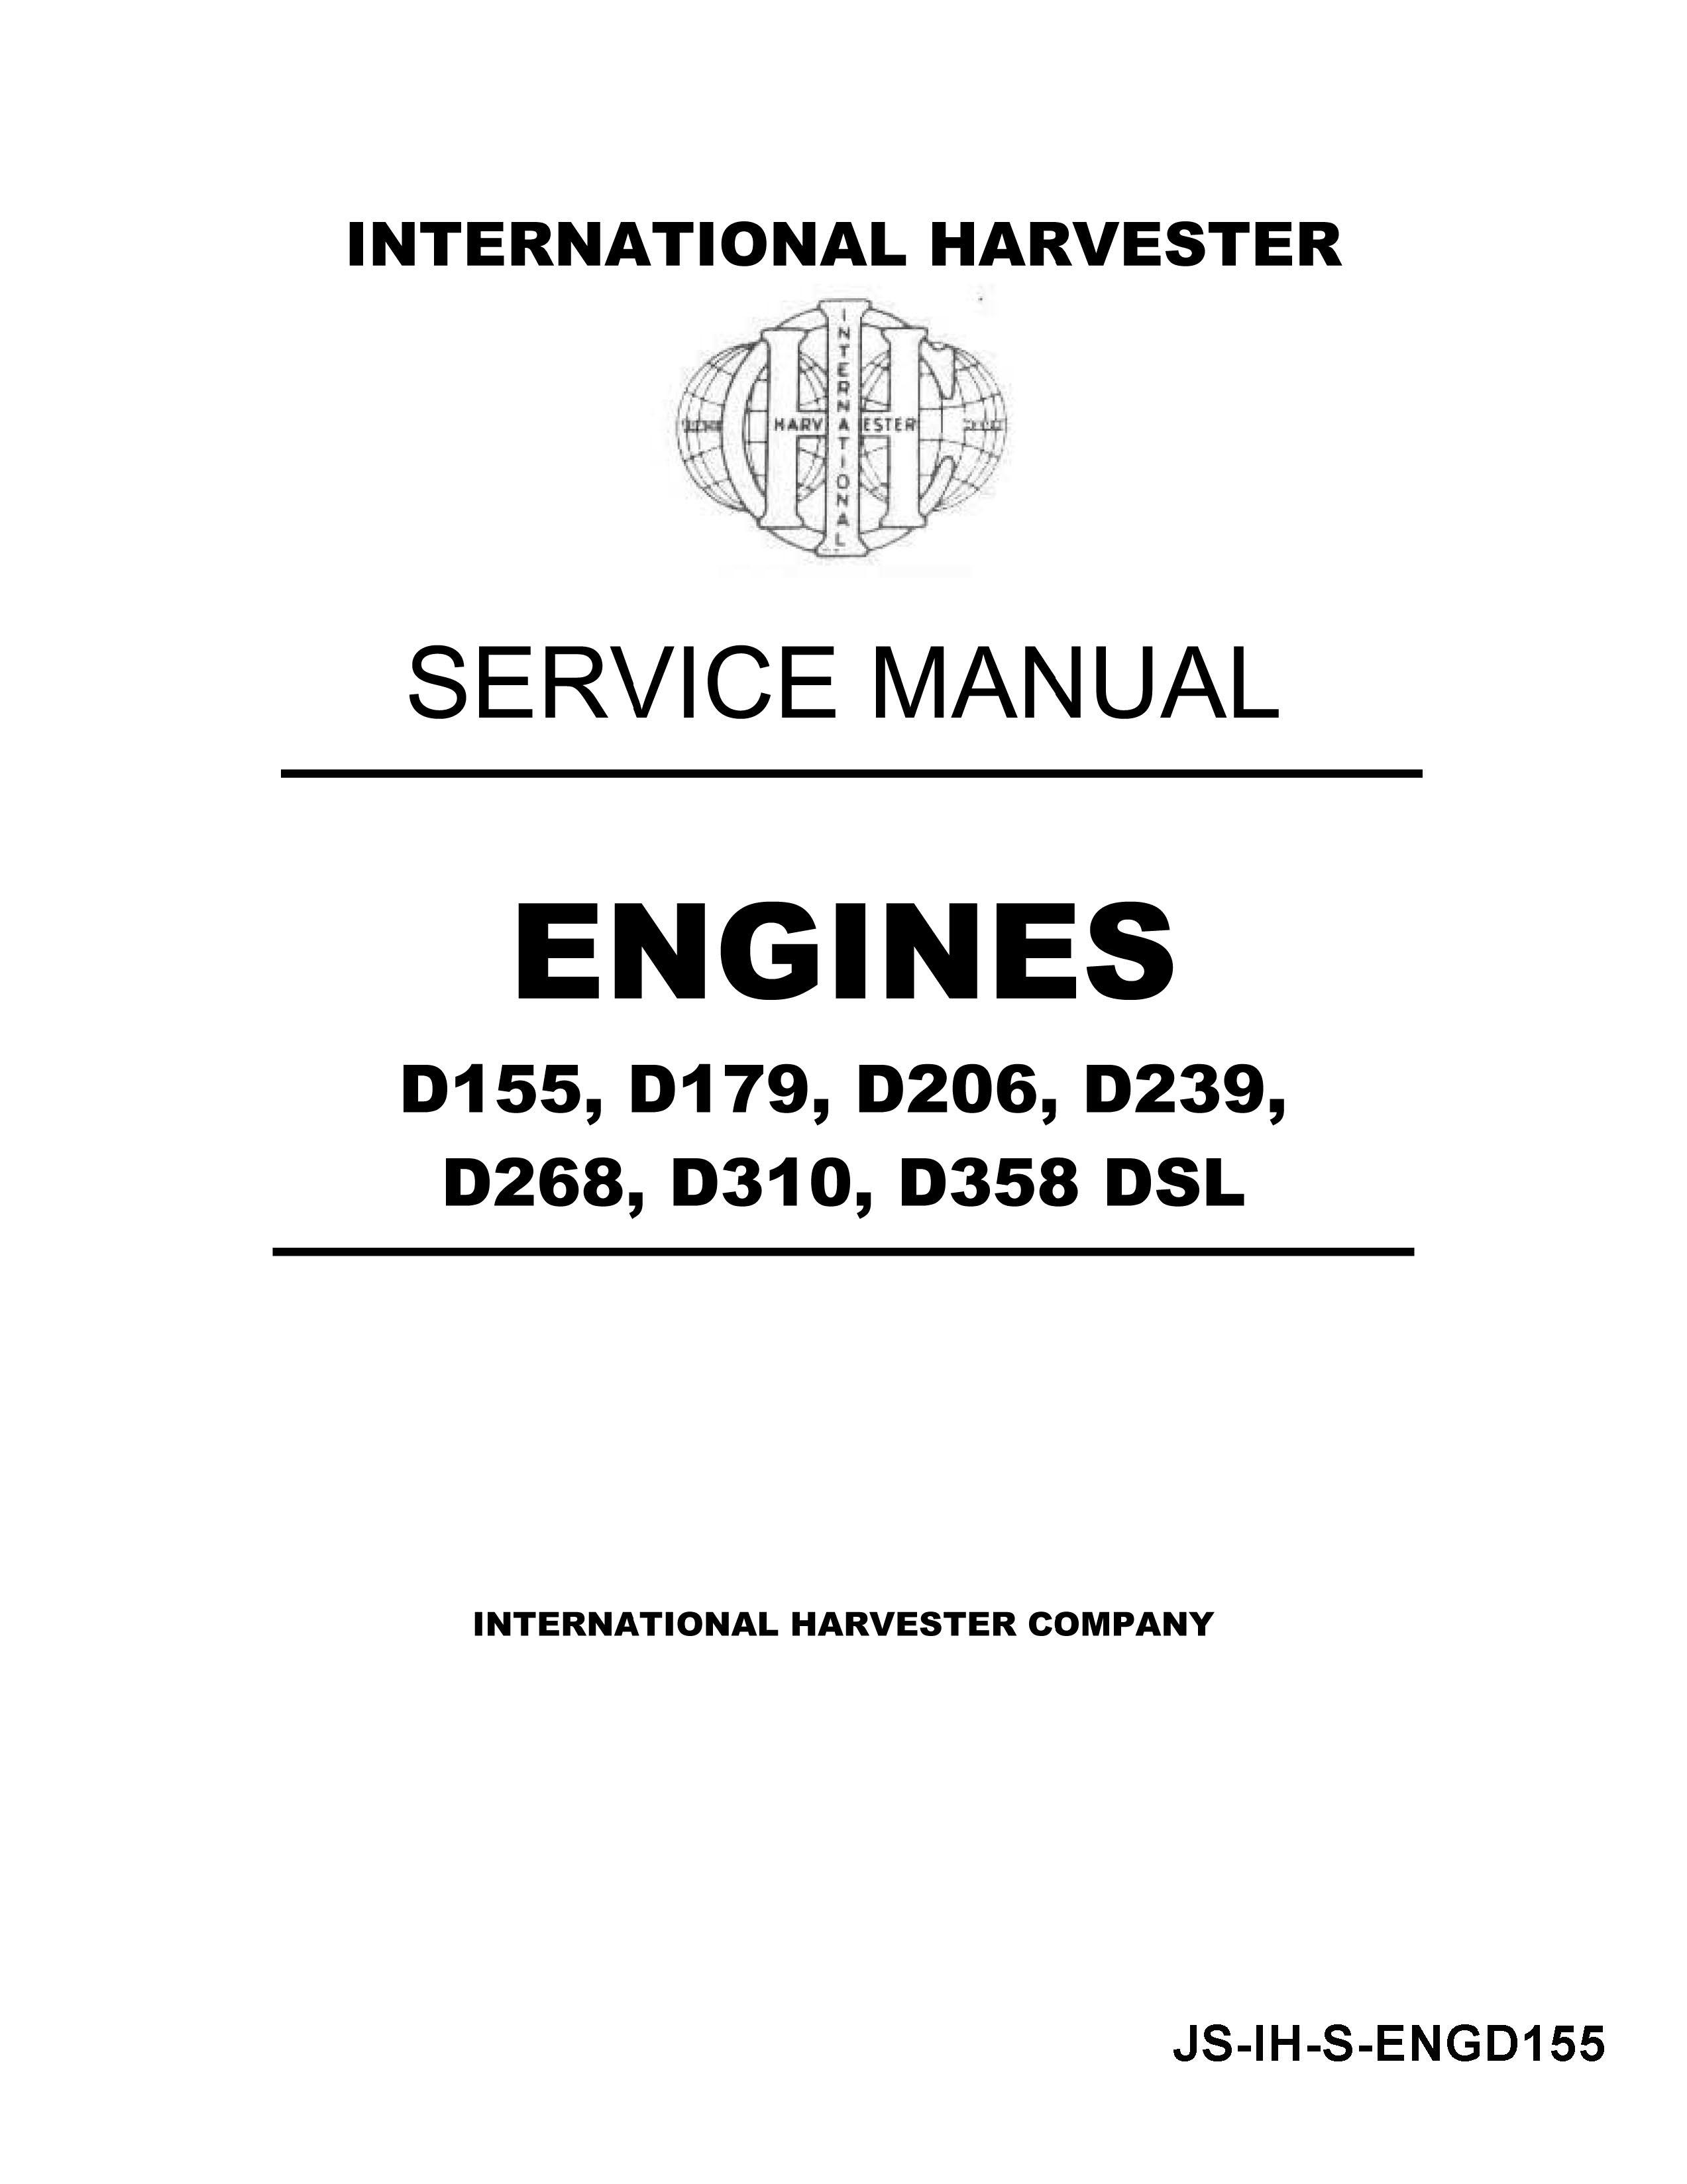 ih diesel engine d155 d179 d206 d239 d268 d310 d358 manual ih diesel engine d155 d179 d206 d239 d268 d310 d358 manual page 1